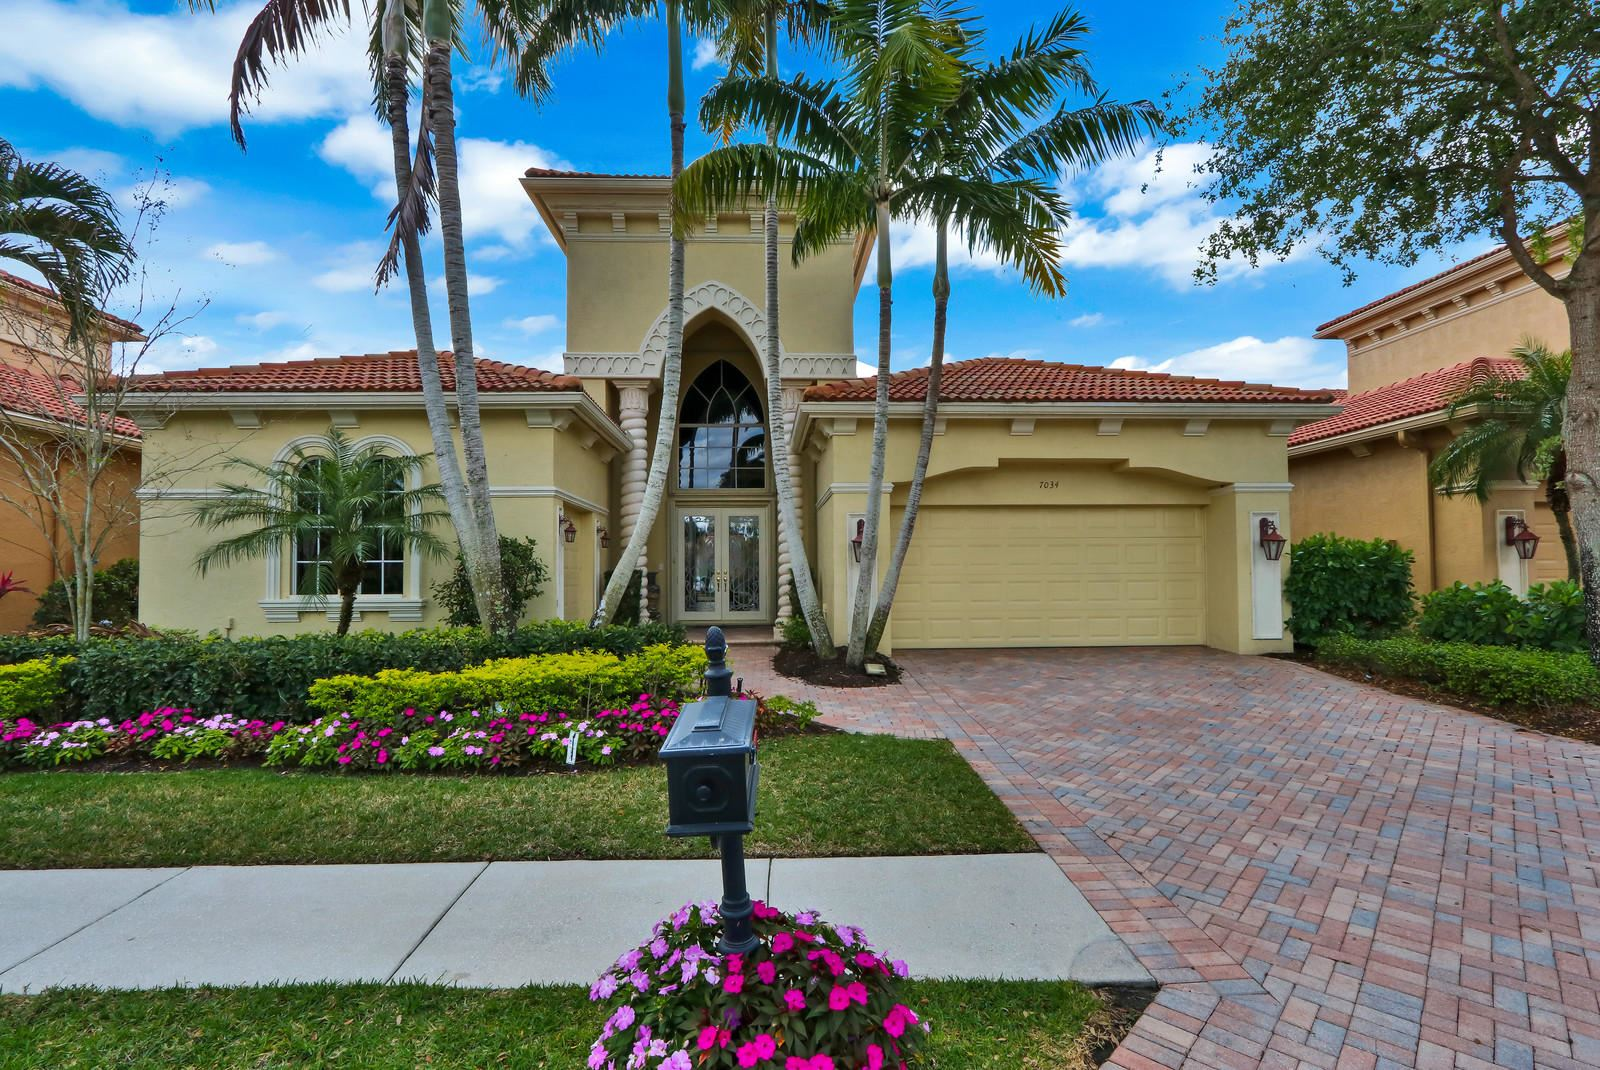 7034 Tradition Cove Lane W, West Palm Beach, FL 33412 - MLS#: RX-10608584